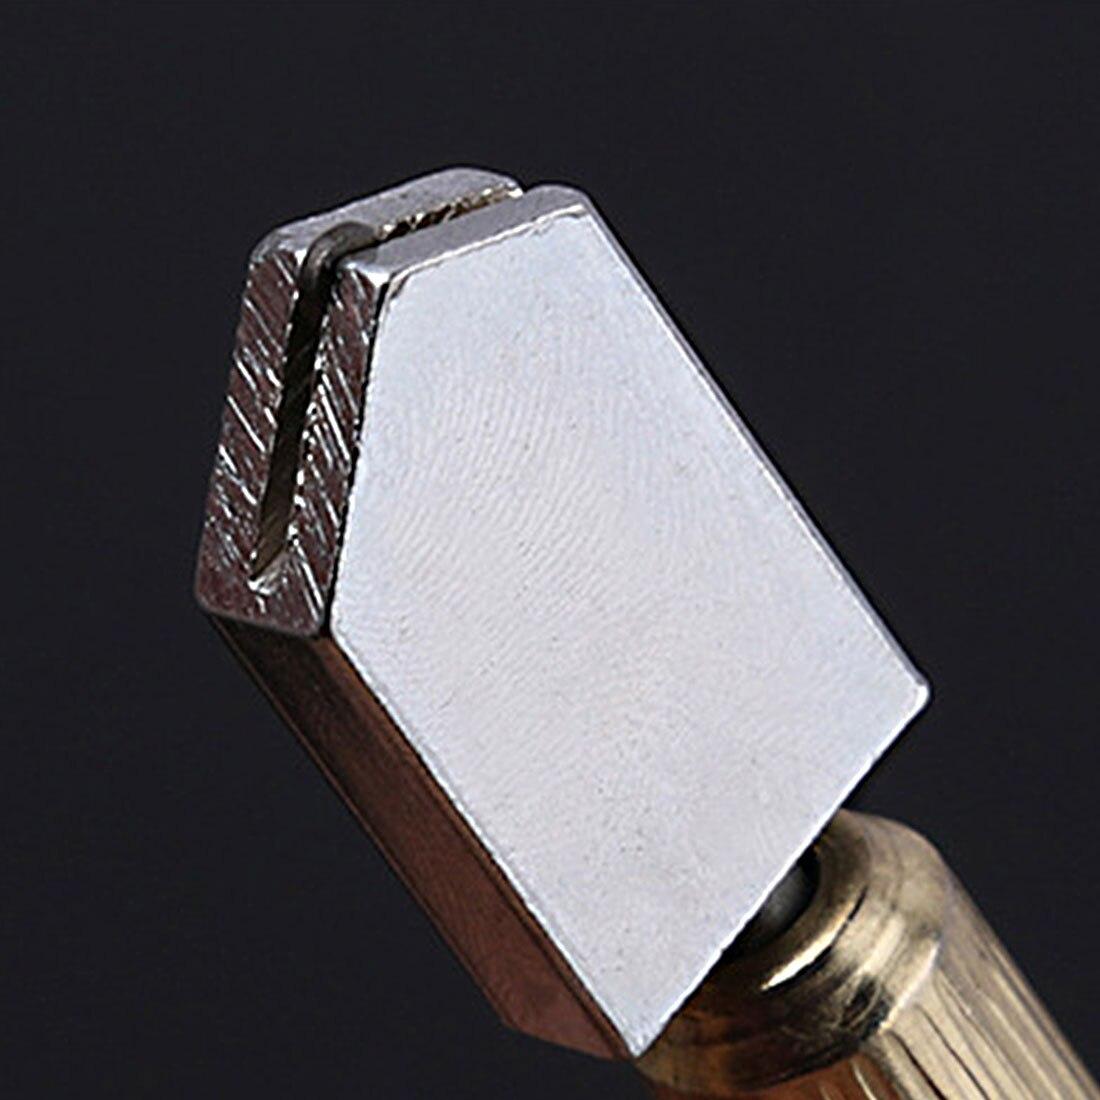 New Glass Cutting Tool Diamond Glass Cutter Antislip Metal Handle Steel Blade Oil Filled Bottle Glass Cutter